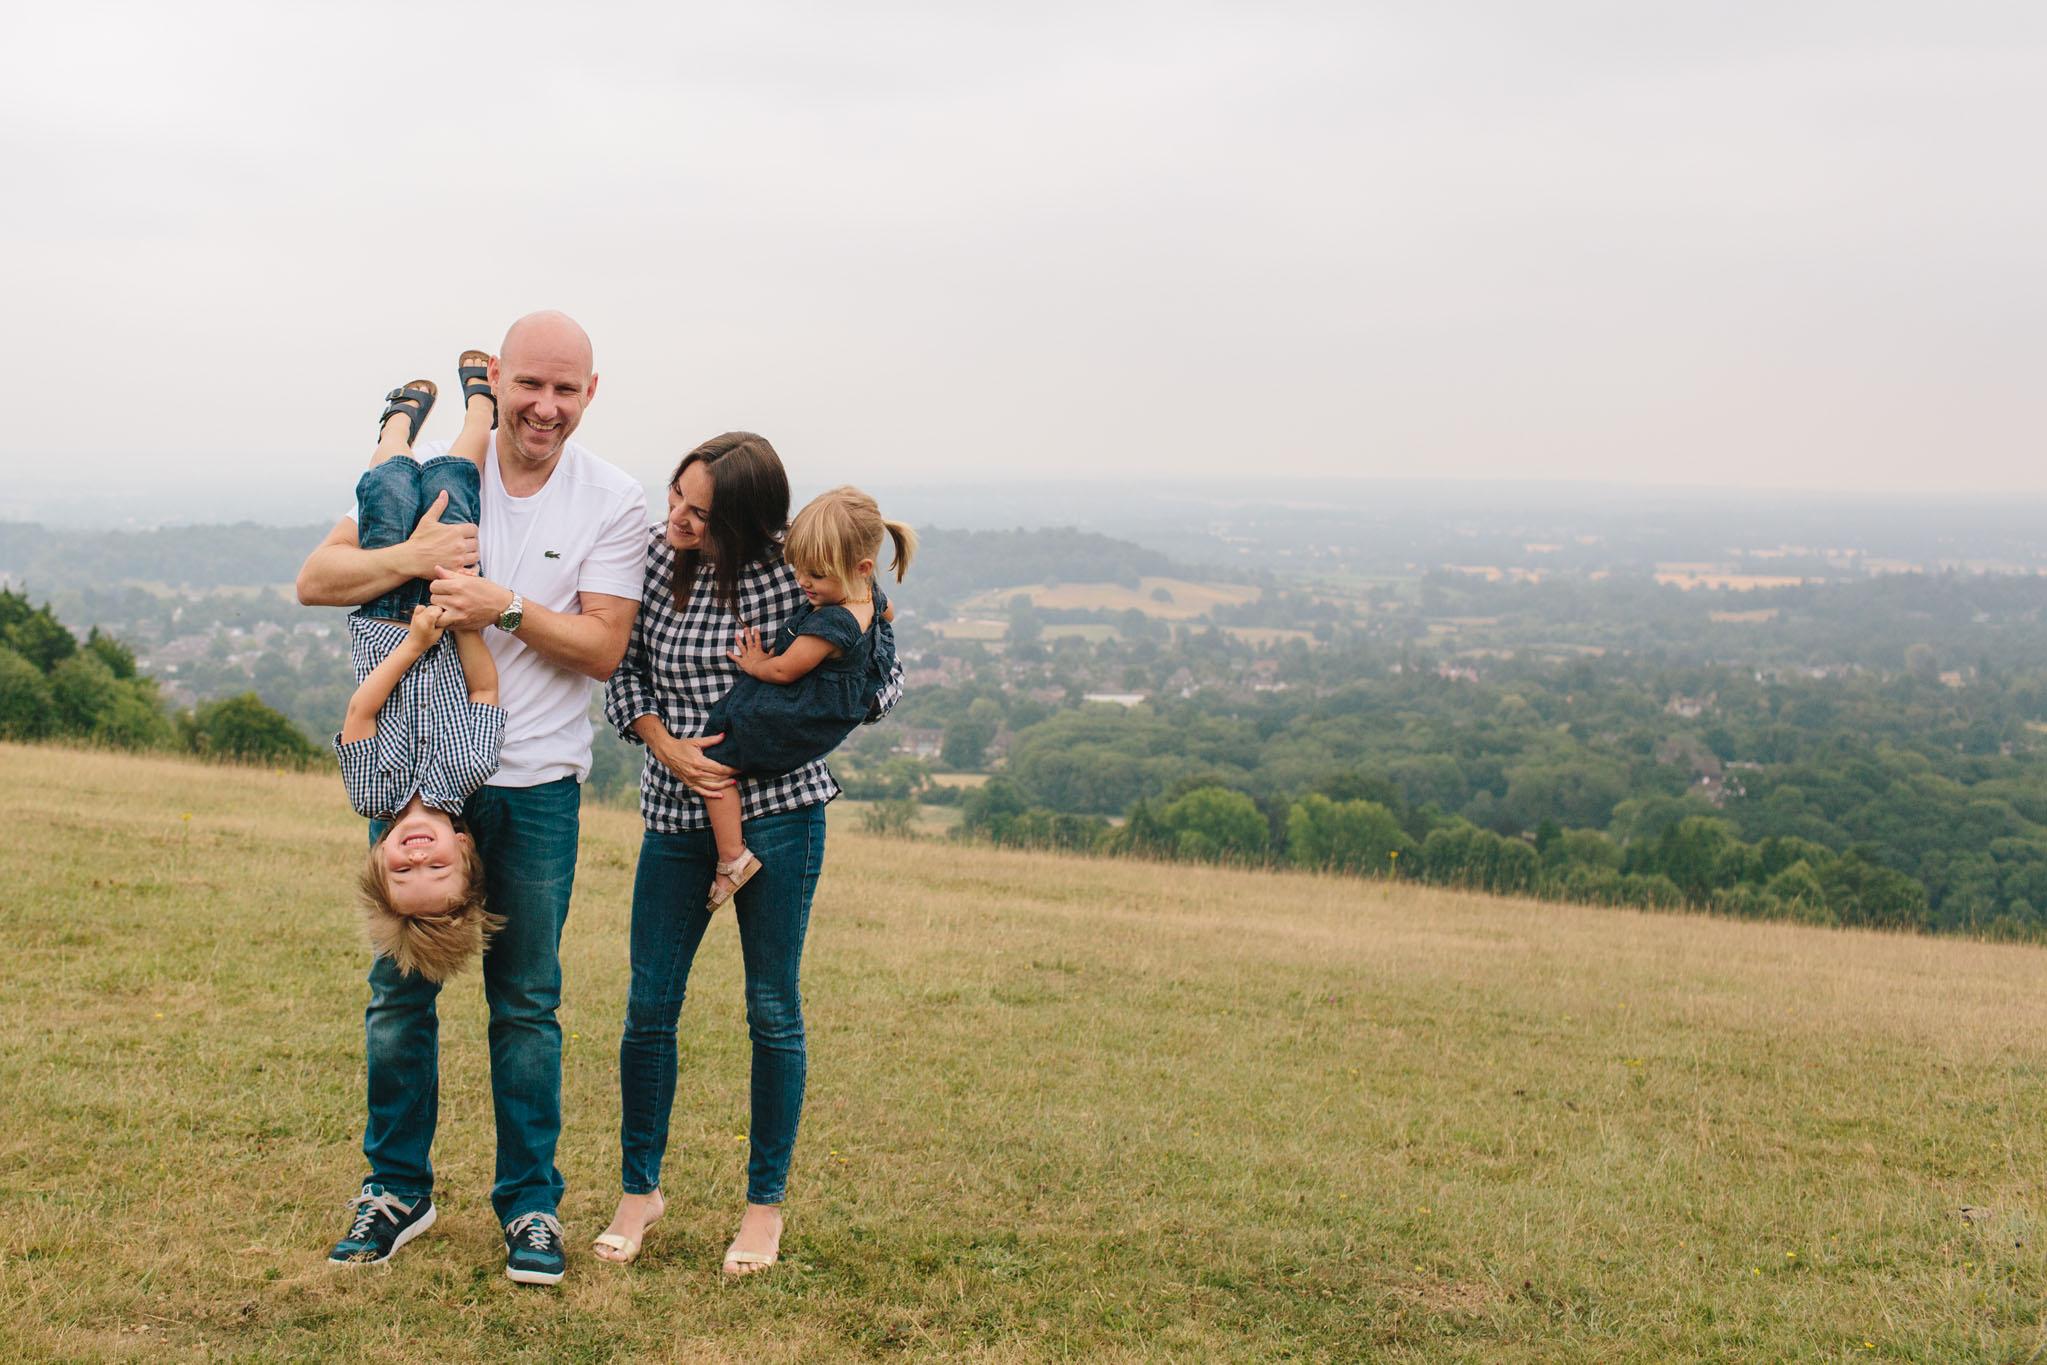 family documentary, lifestyle